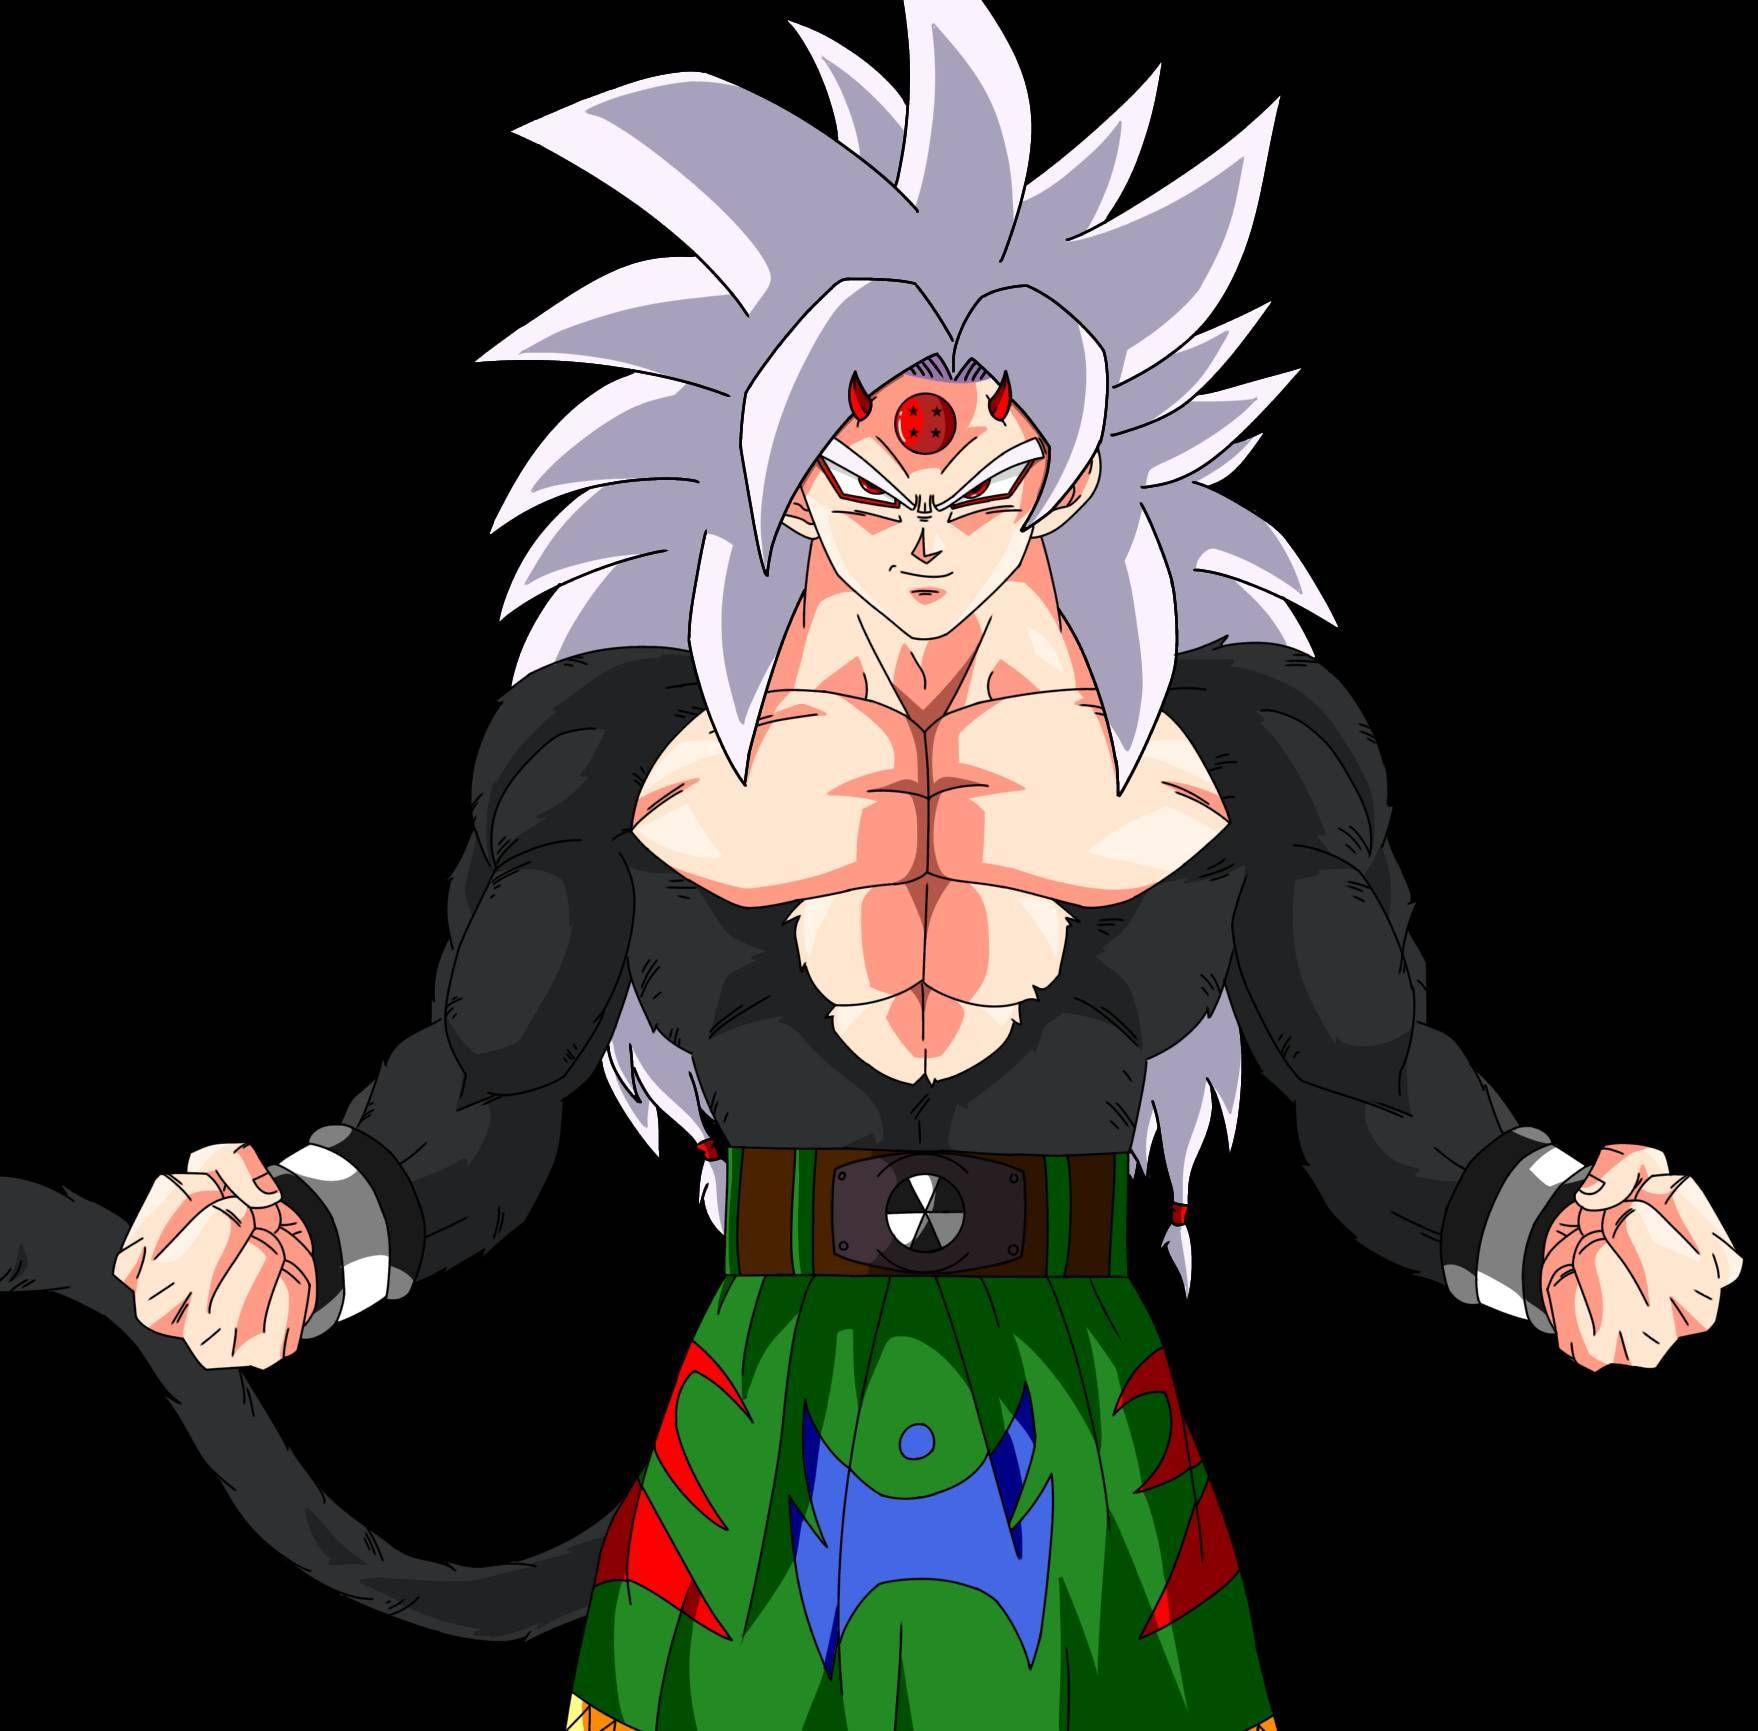 Goku Super Saiyan 6 By Ivansalina On Deviantart In 2020 Dragon